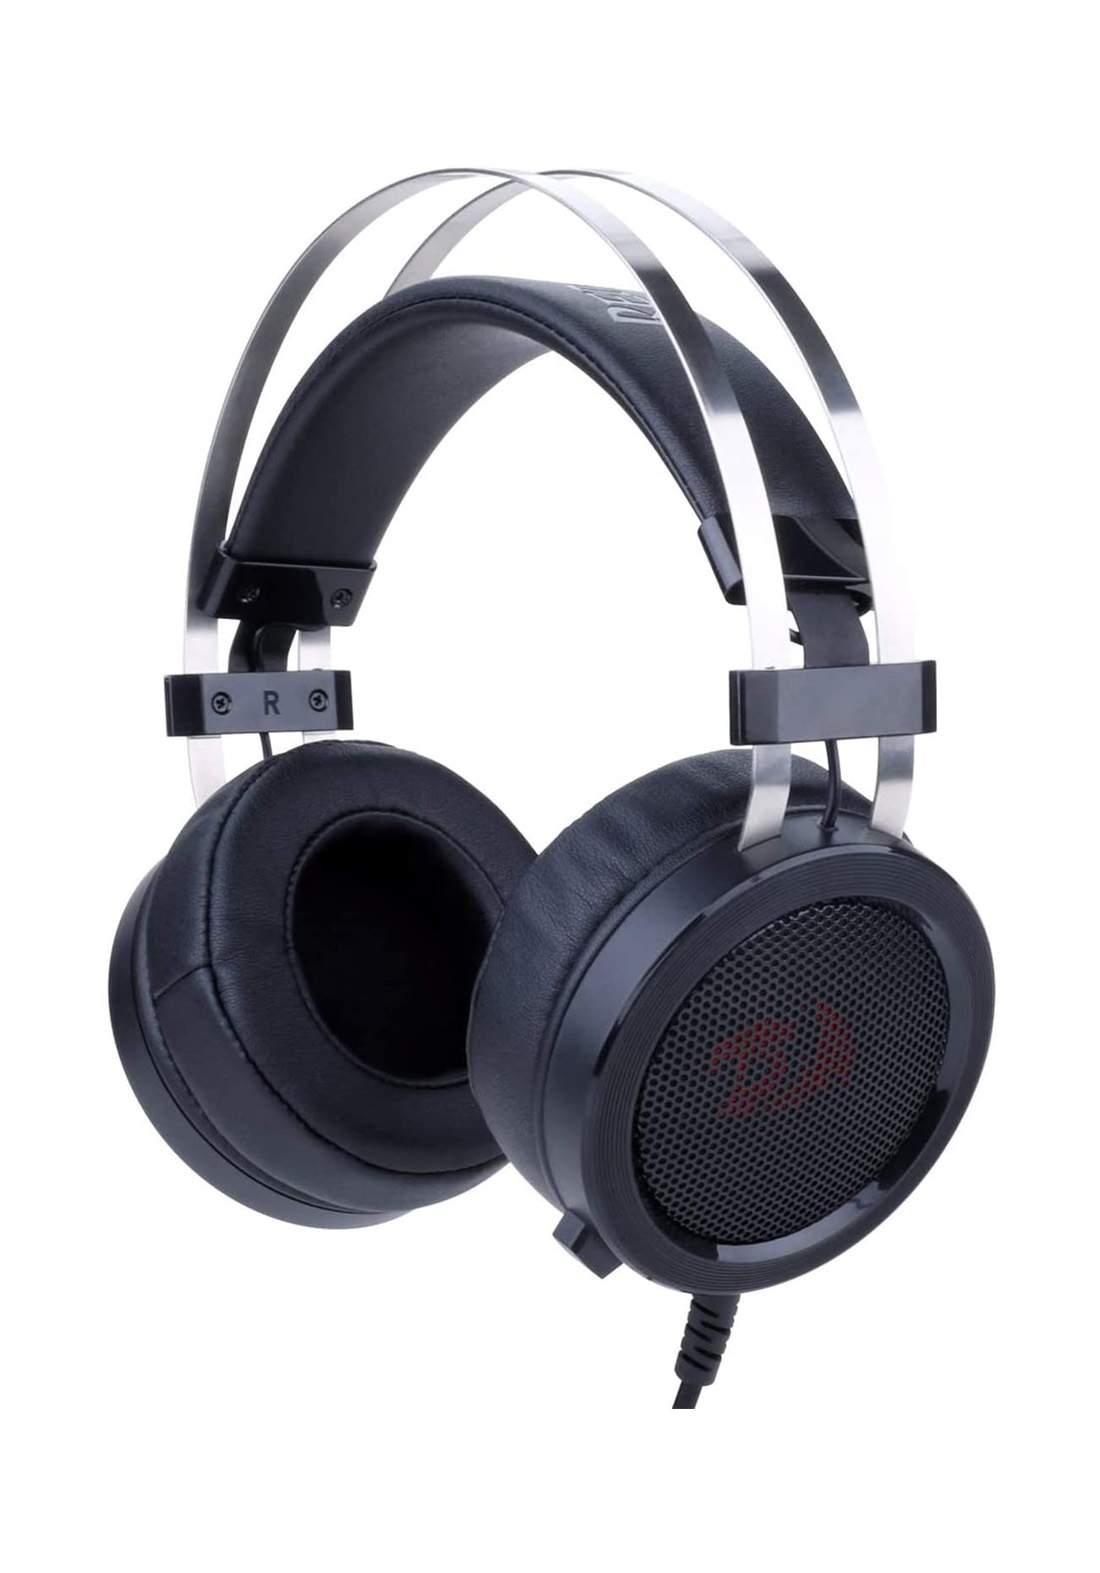 Redragon Gaming Headset Wired Audio Aux 3.5mm Scylla - Black سماعة سلكية